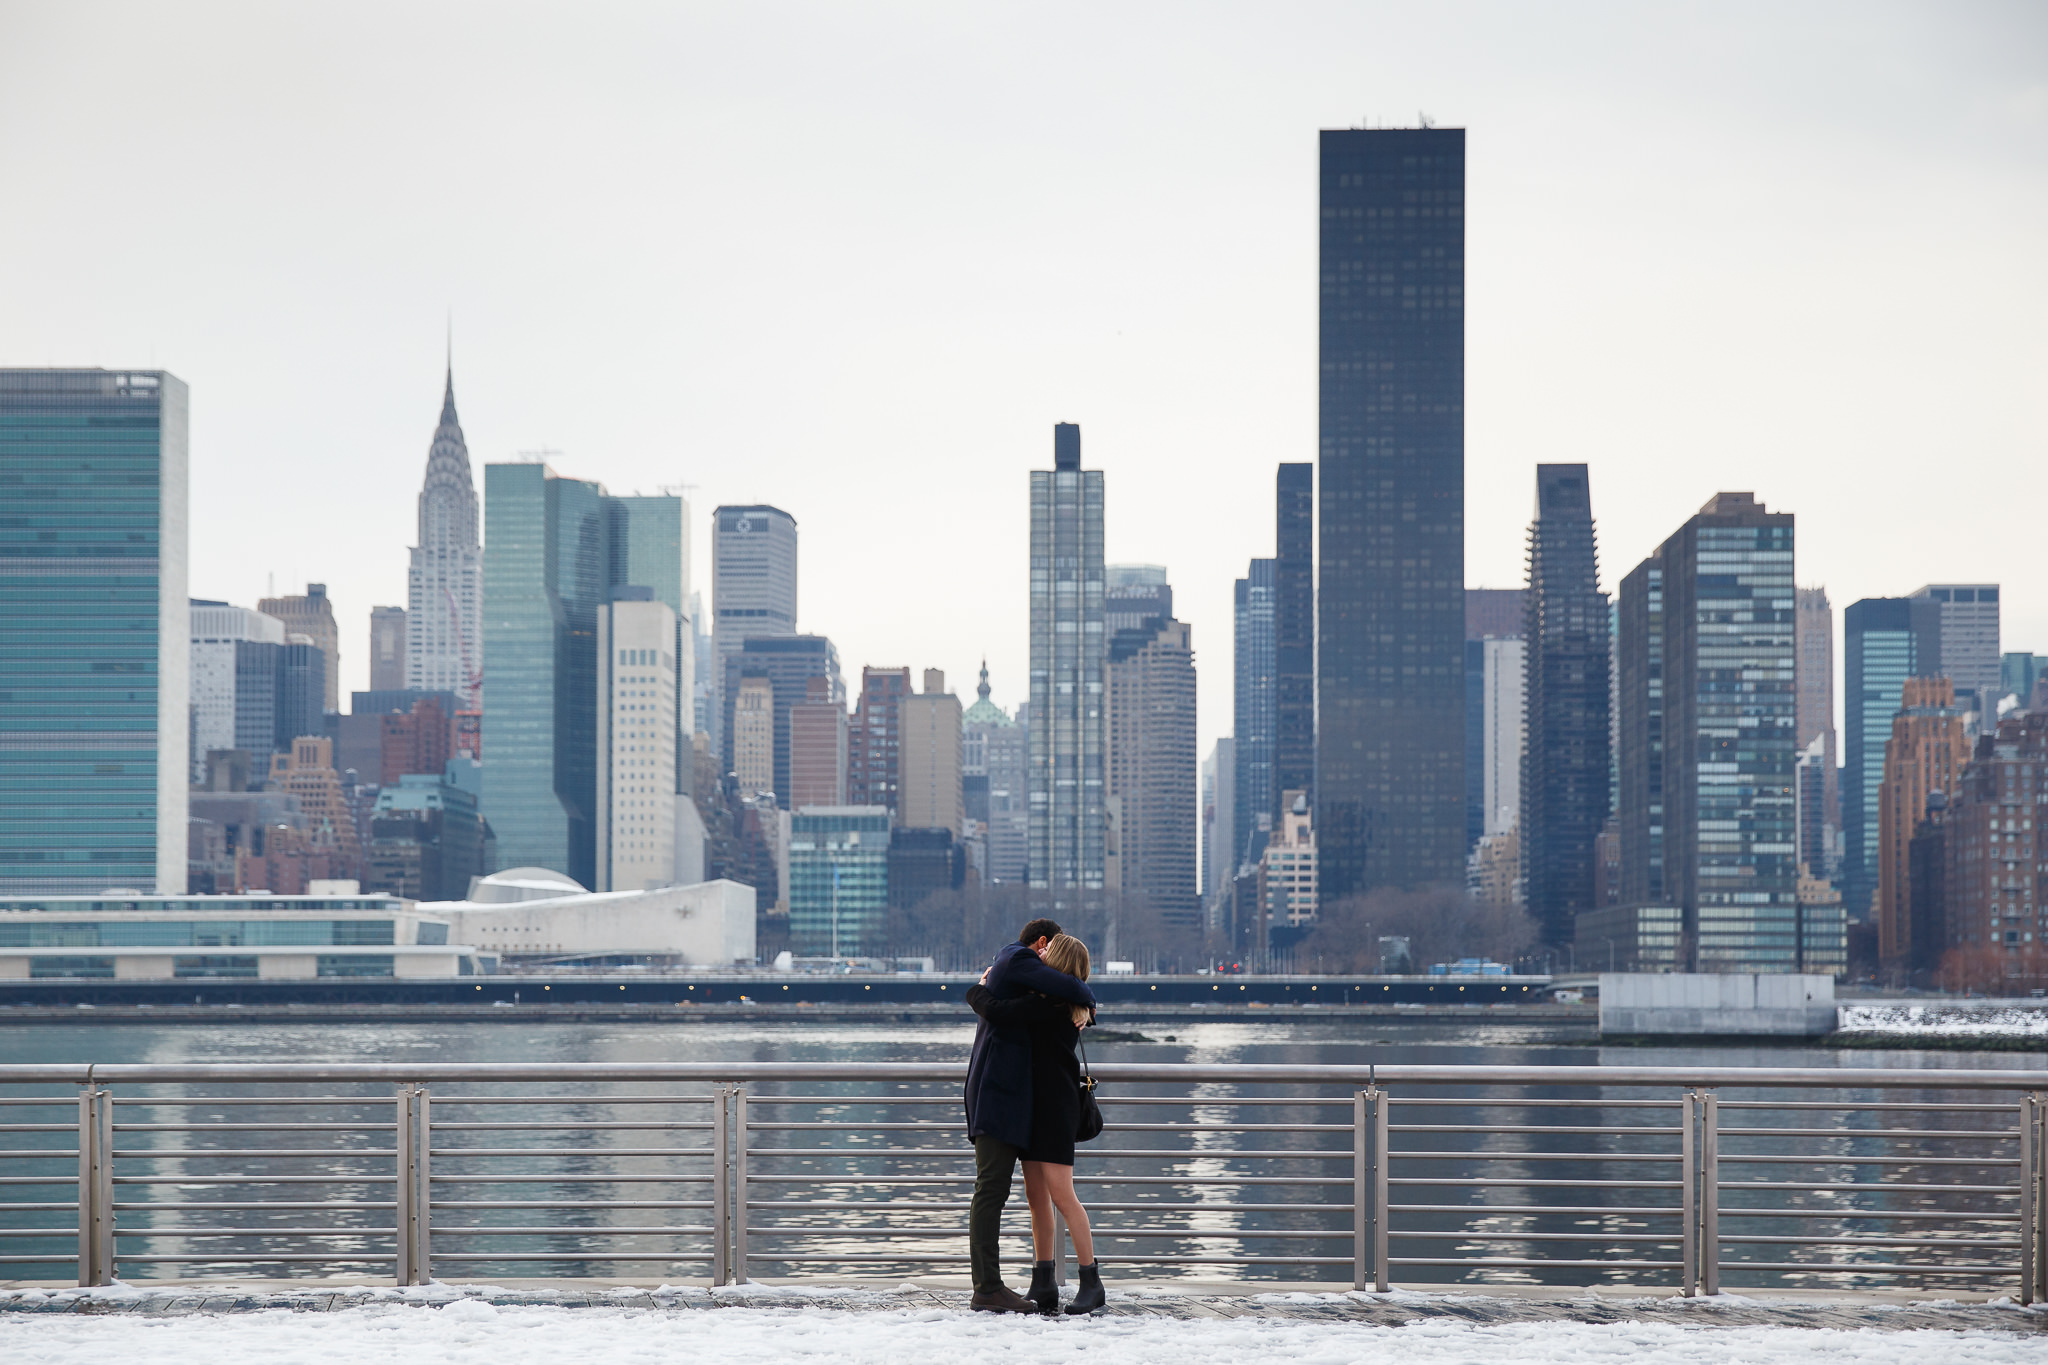 new york city engagement photographer, new york city proposal photographer, gantry plaza engagement, gantry plaza proposal, long island city engagement photographer, long island city wedding